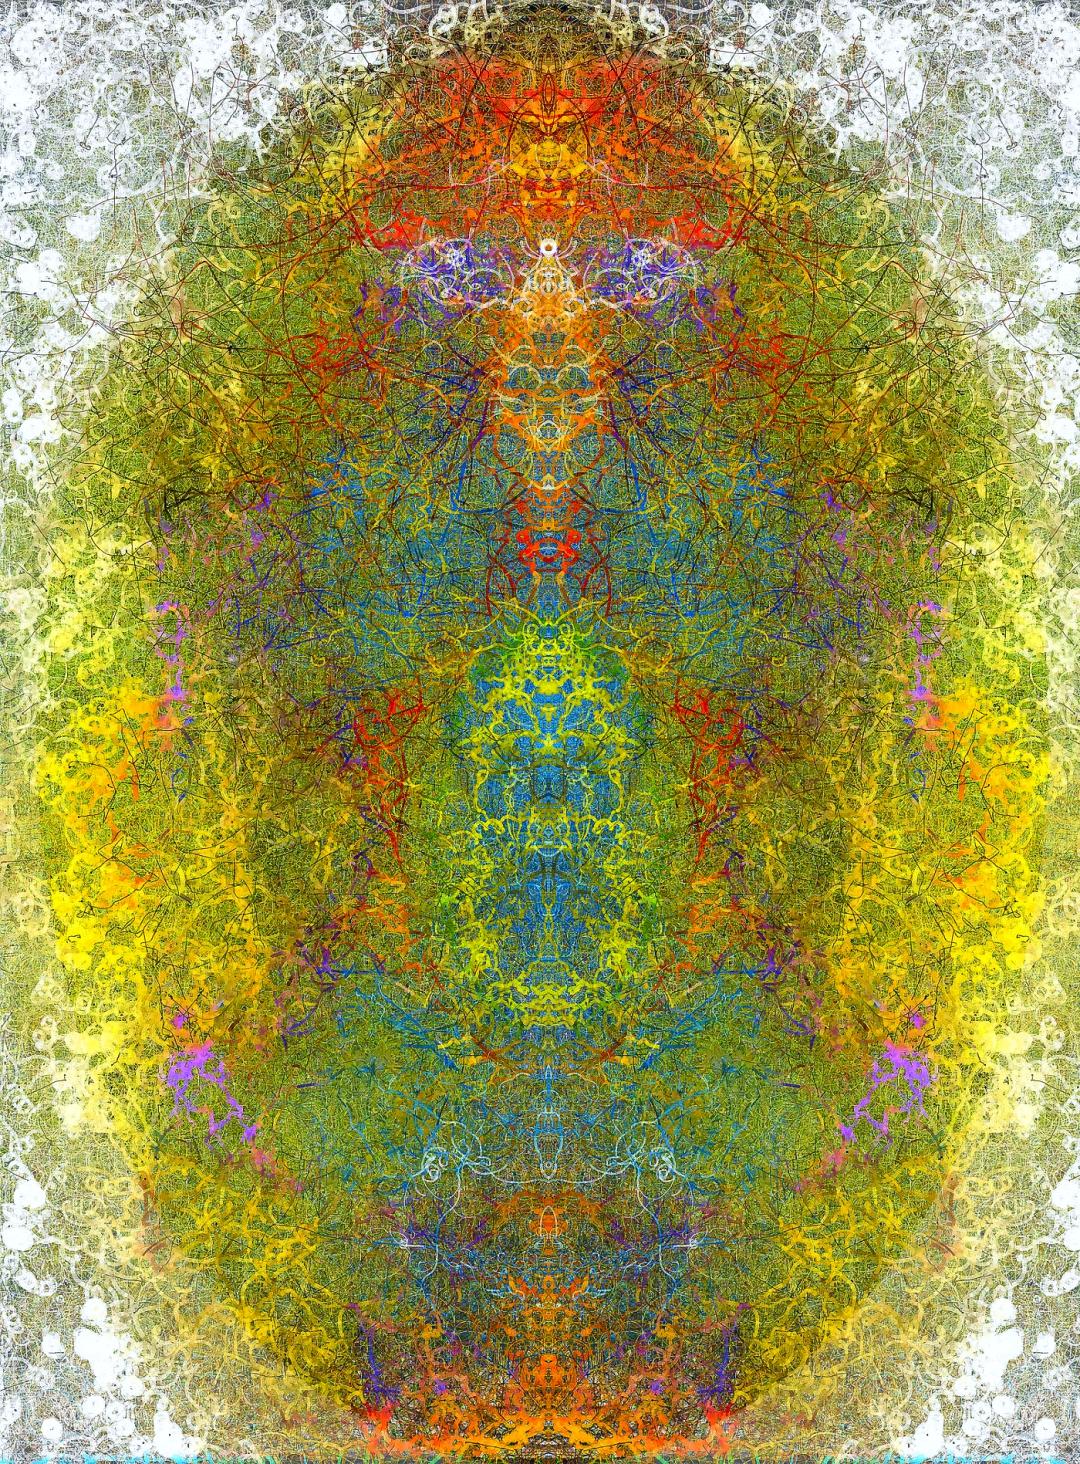 Stephen Calhoun, USA, generative experimental artist